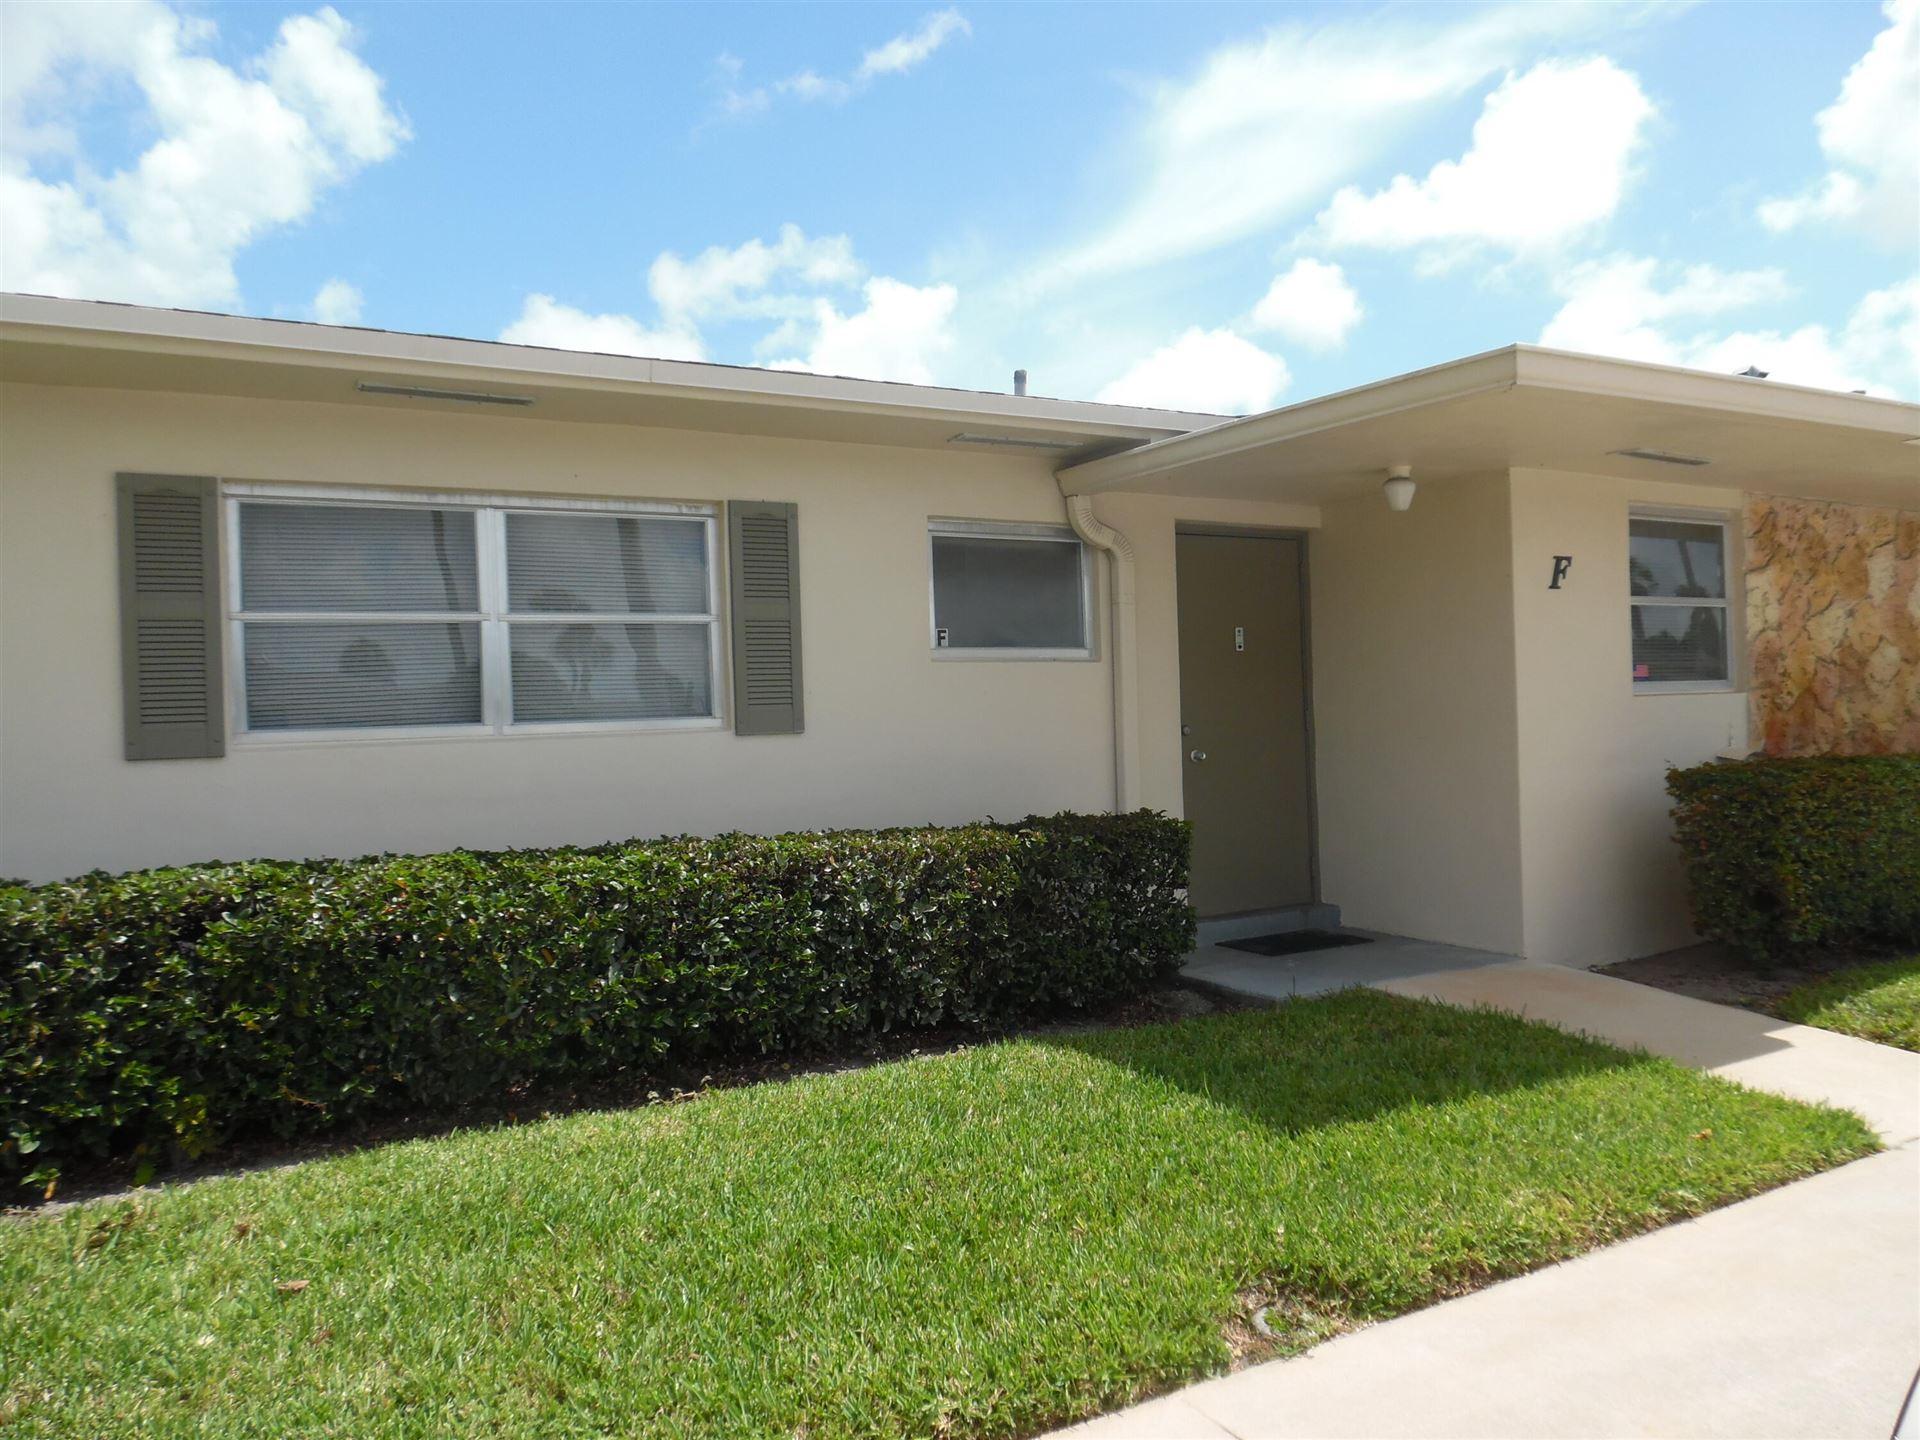 2765 Emory Drive E #F, West Palm Beach, FL 33415 - #: RX-10723753